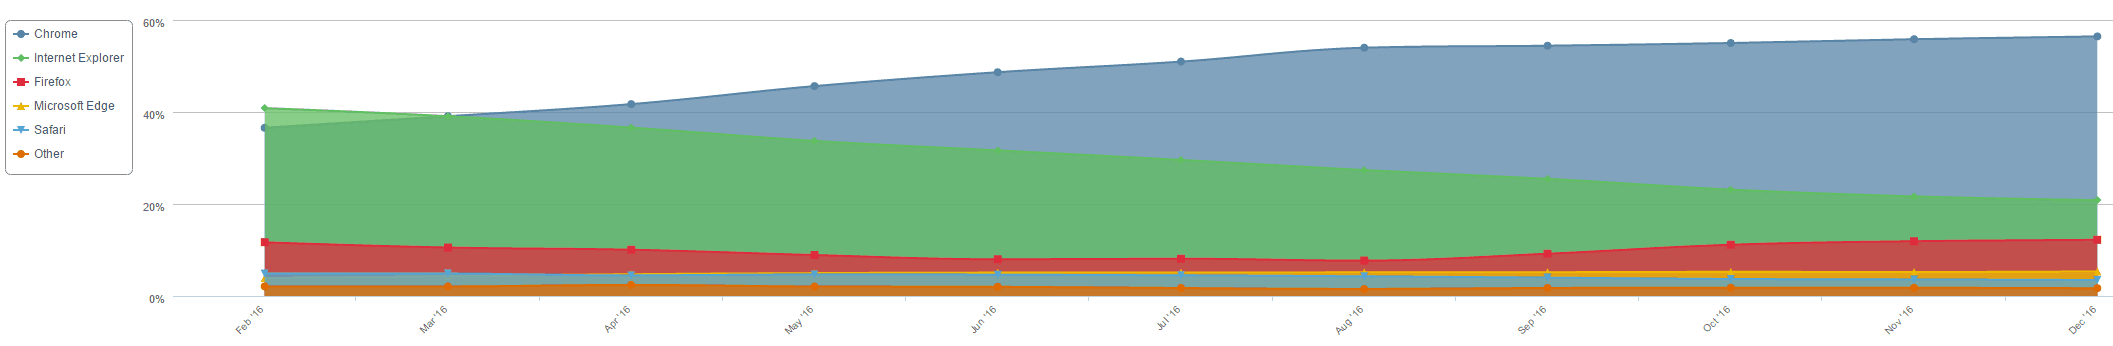 Microsoft Edge and Windows 10 market share increases gradually, according to NetMarketShare OnMSFT.com January 1, 2017